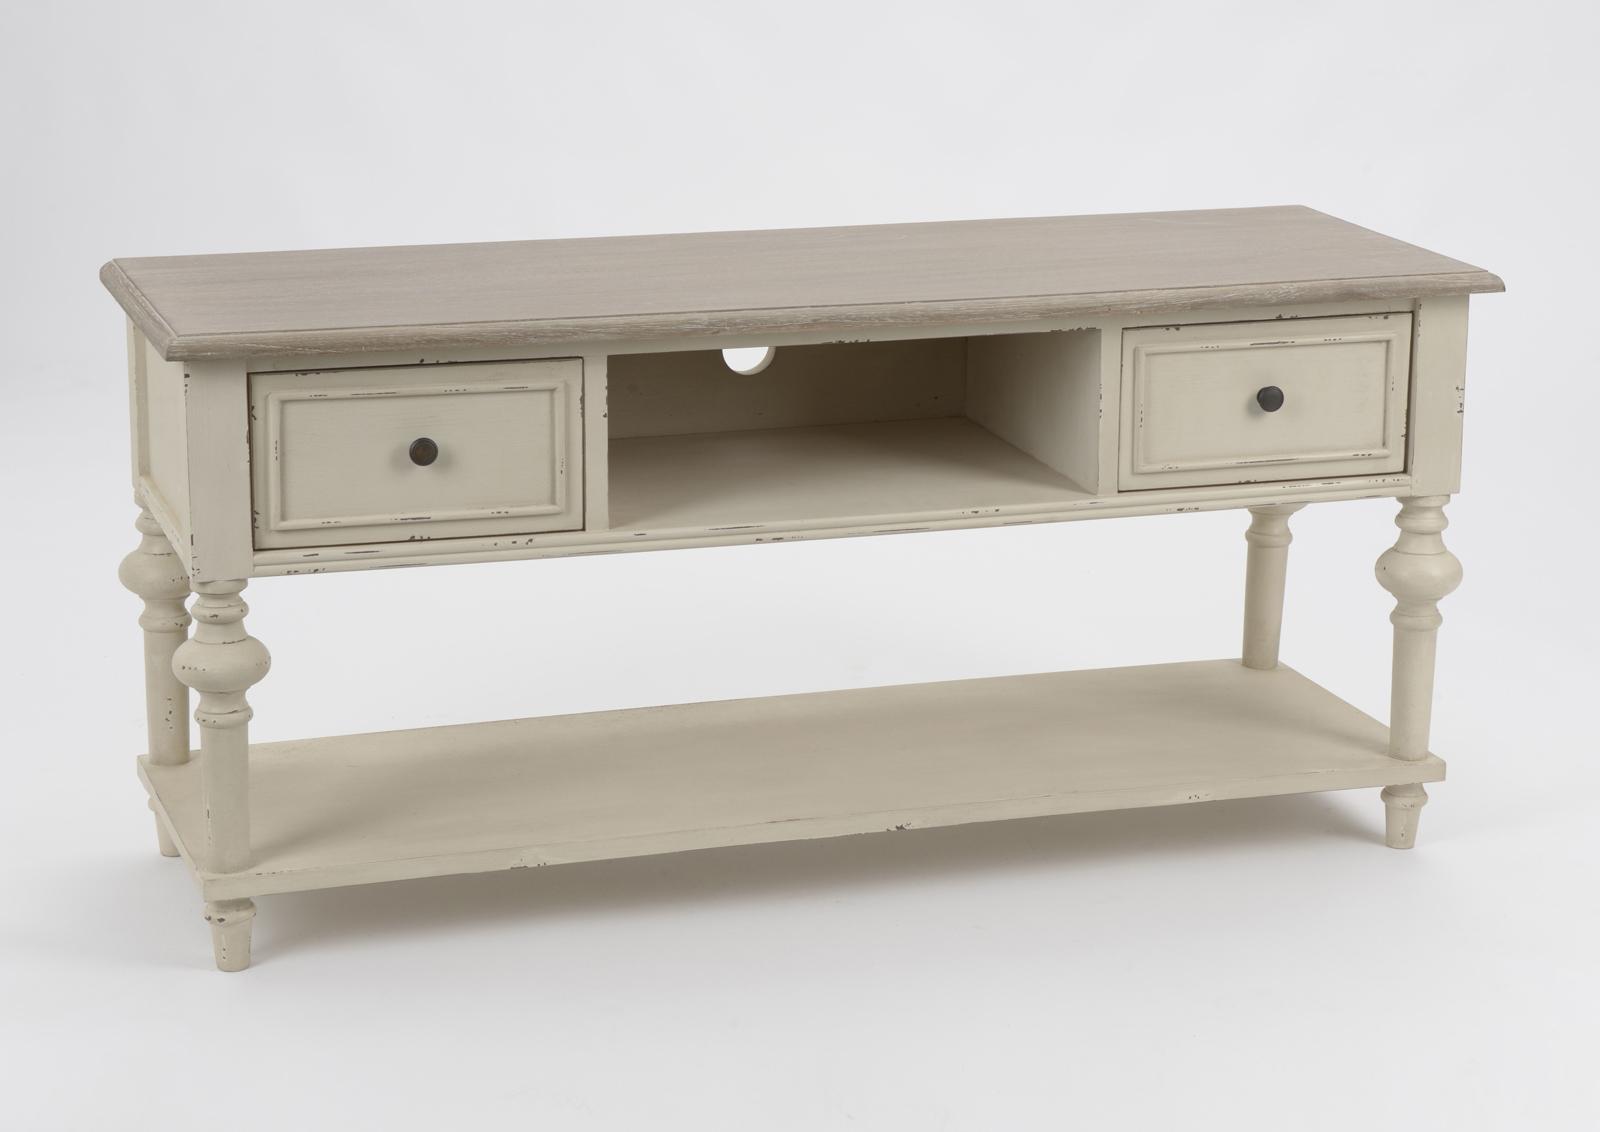 meuble tv bois vieilli bicolore 2 tiroirs legende l120xp40xh55 amadeus